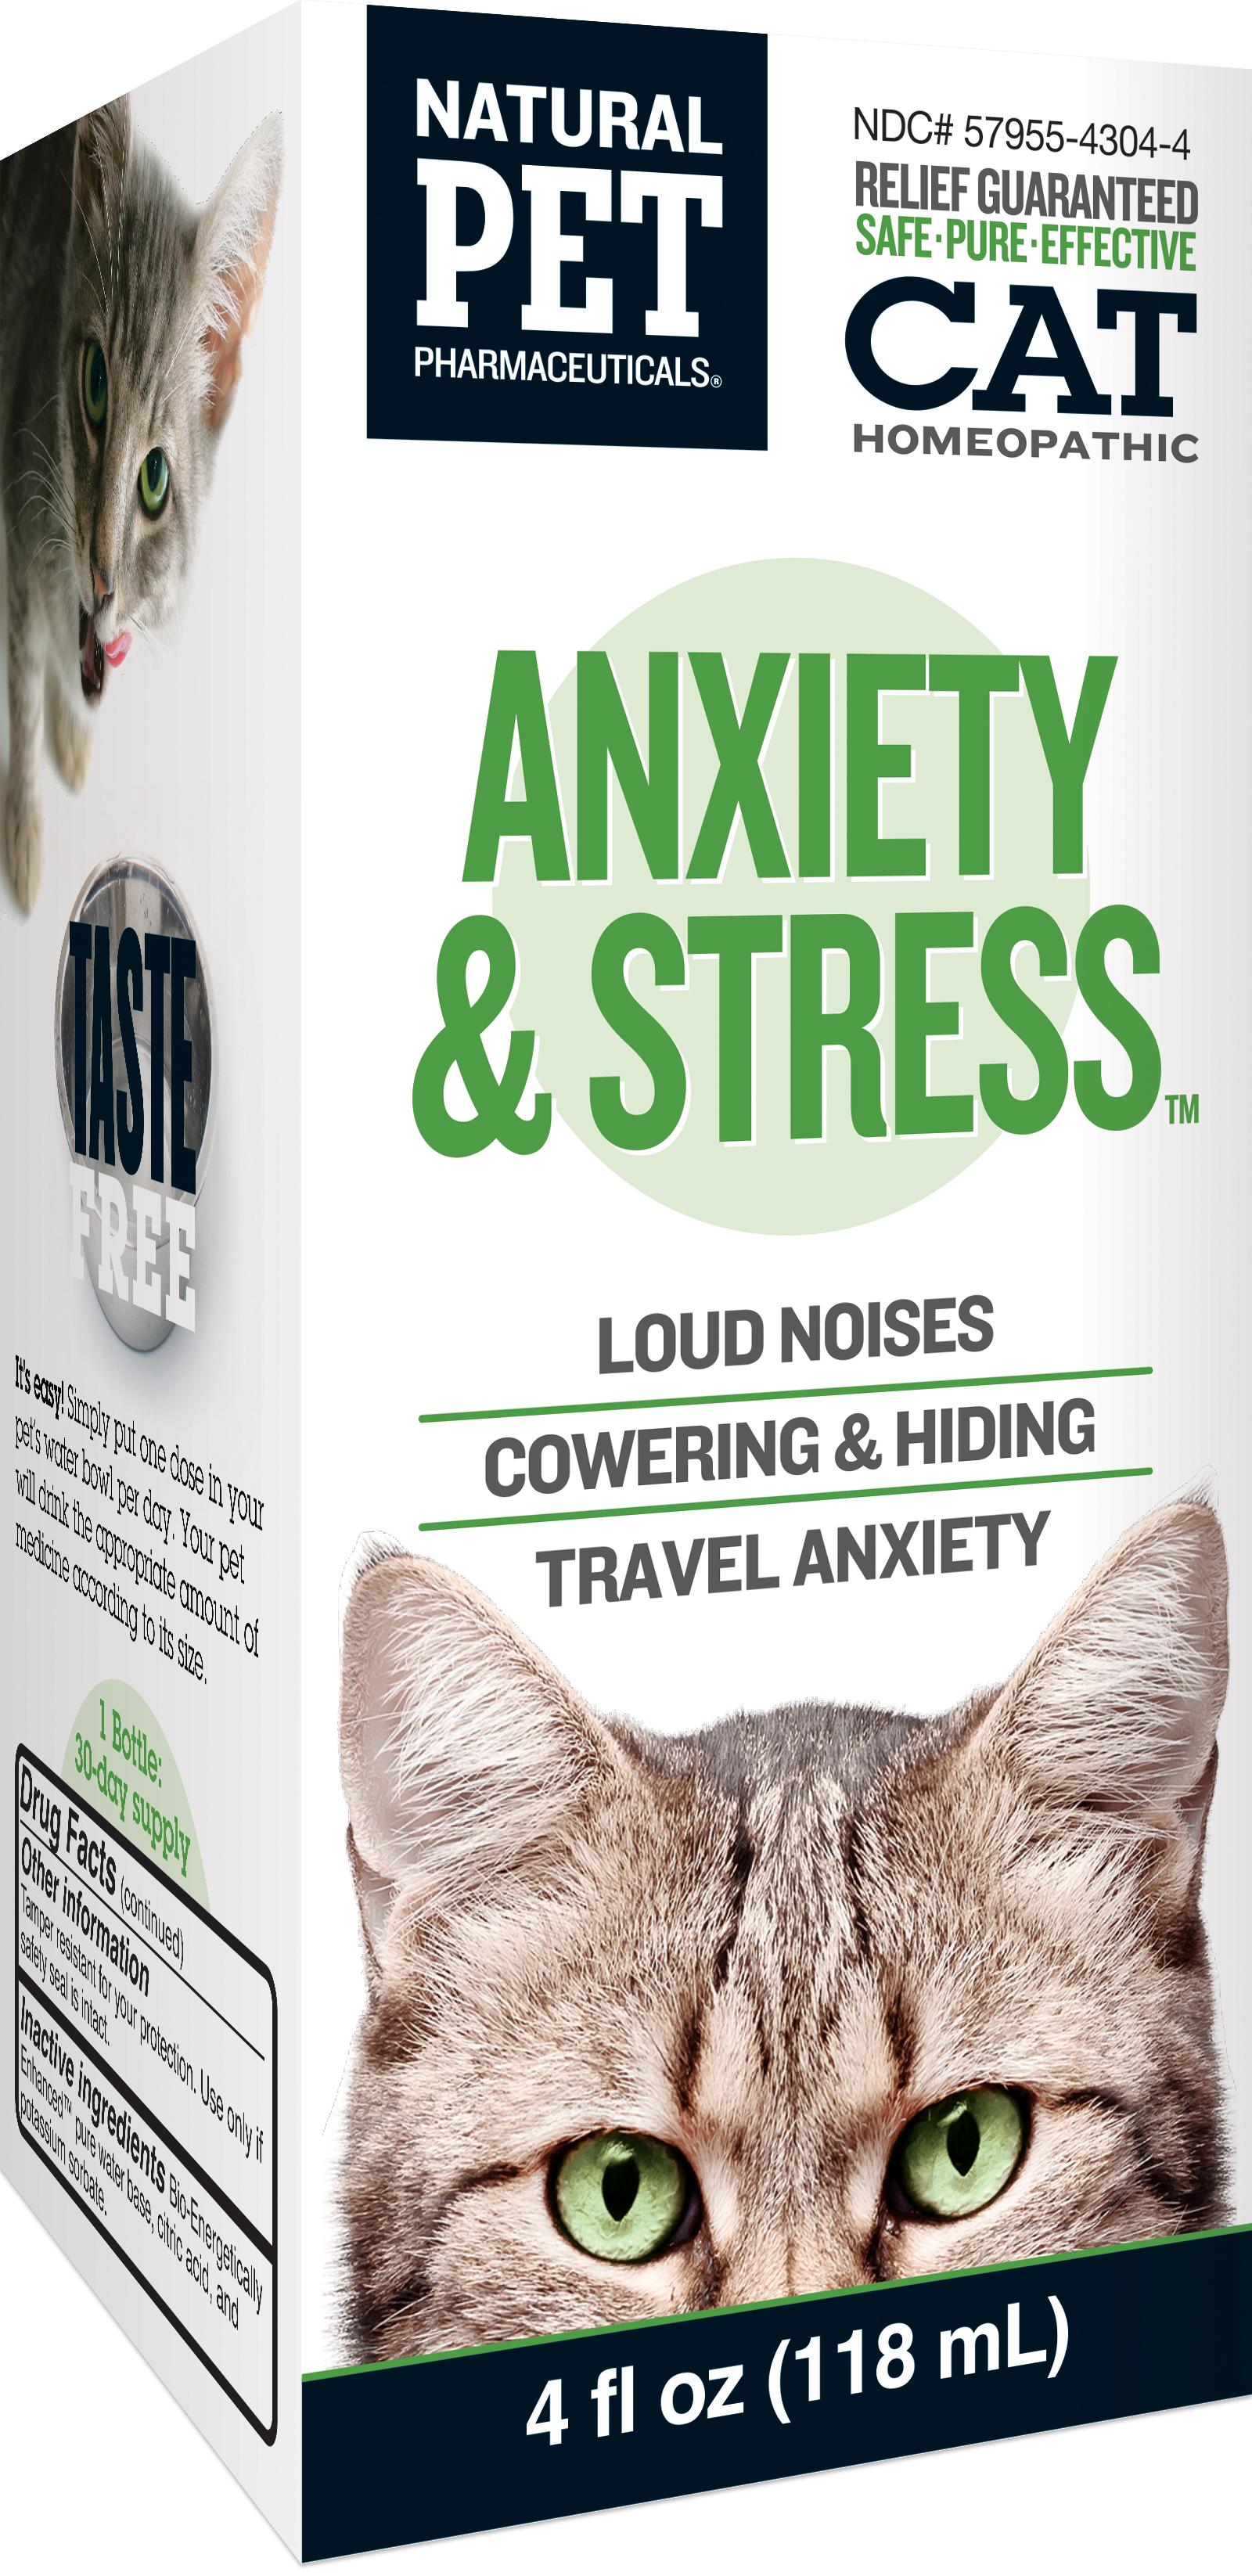 Cat: Anxiety & Stress